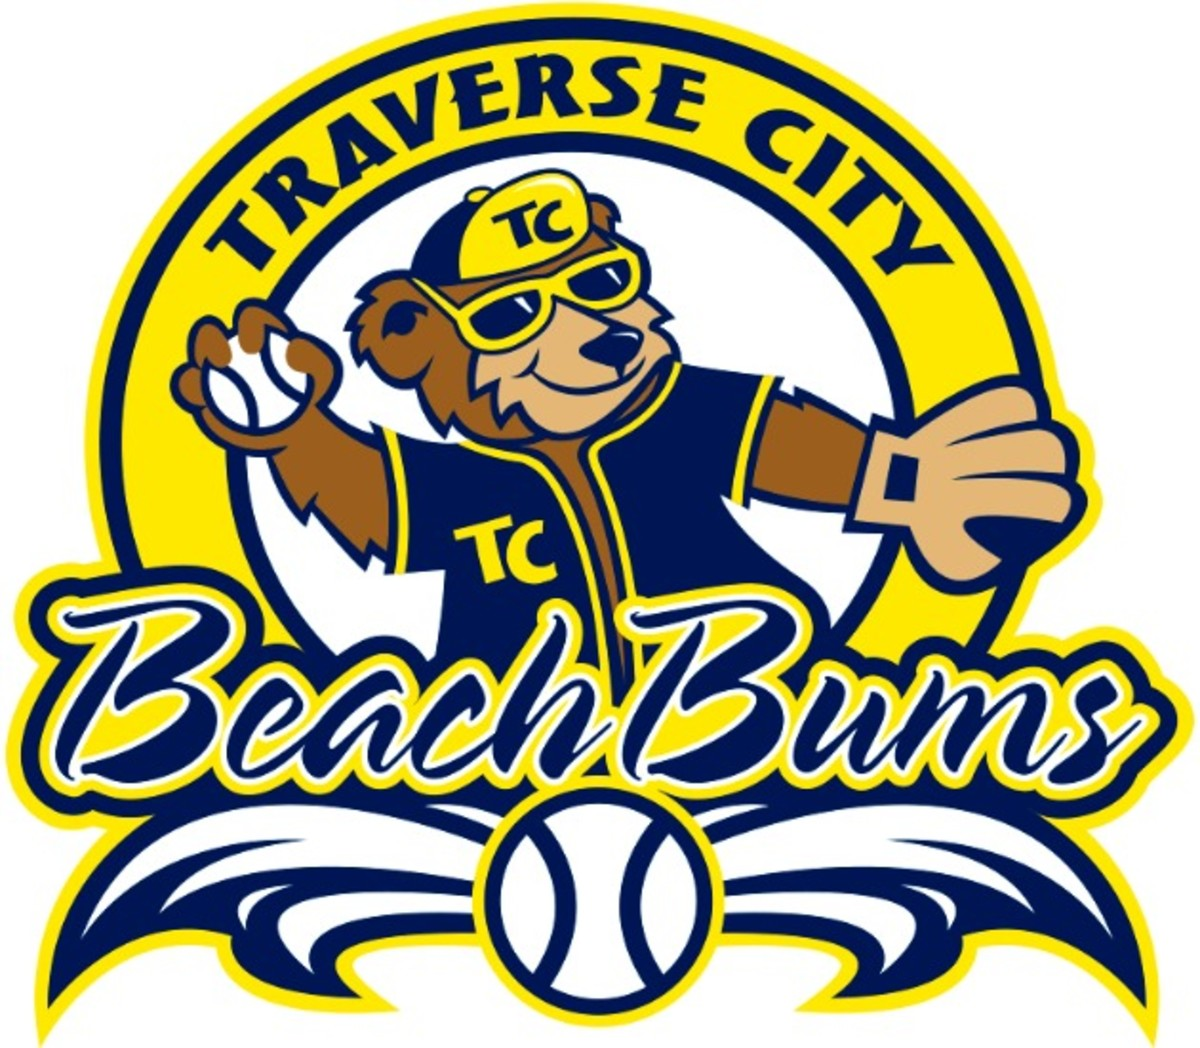 traverse-city-beach-bums.jpg